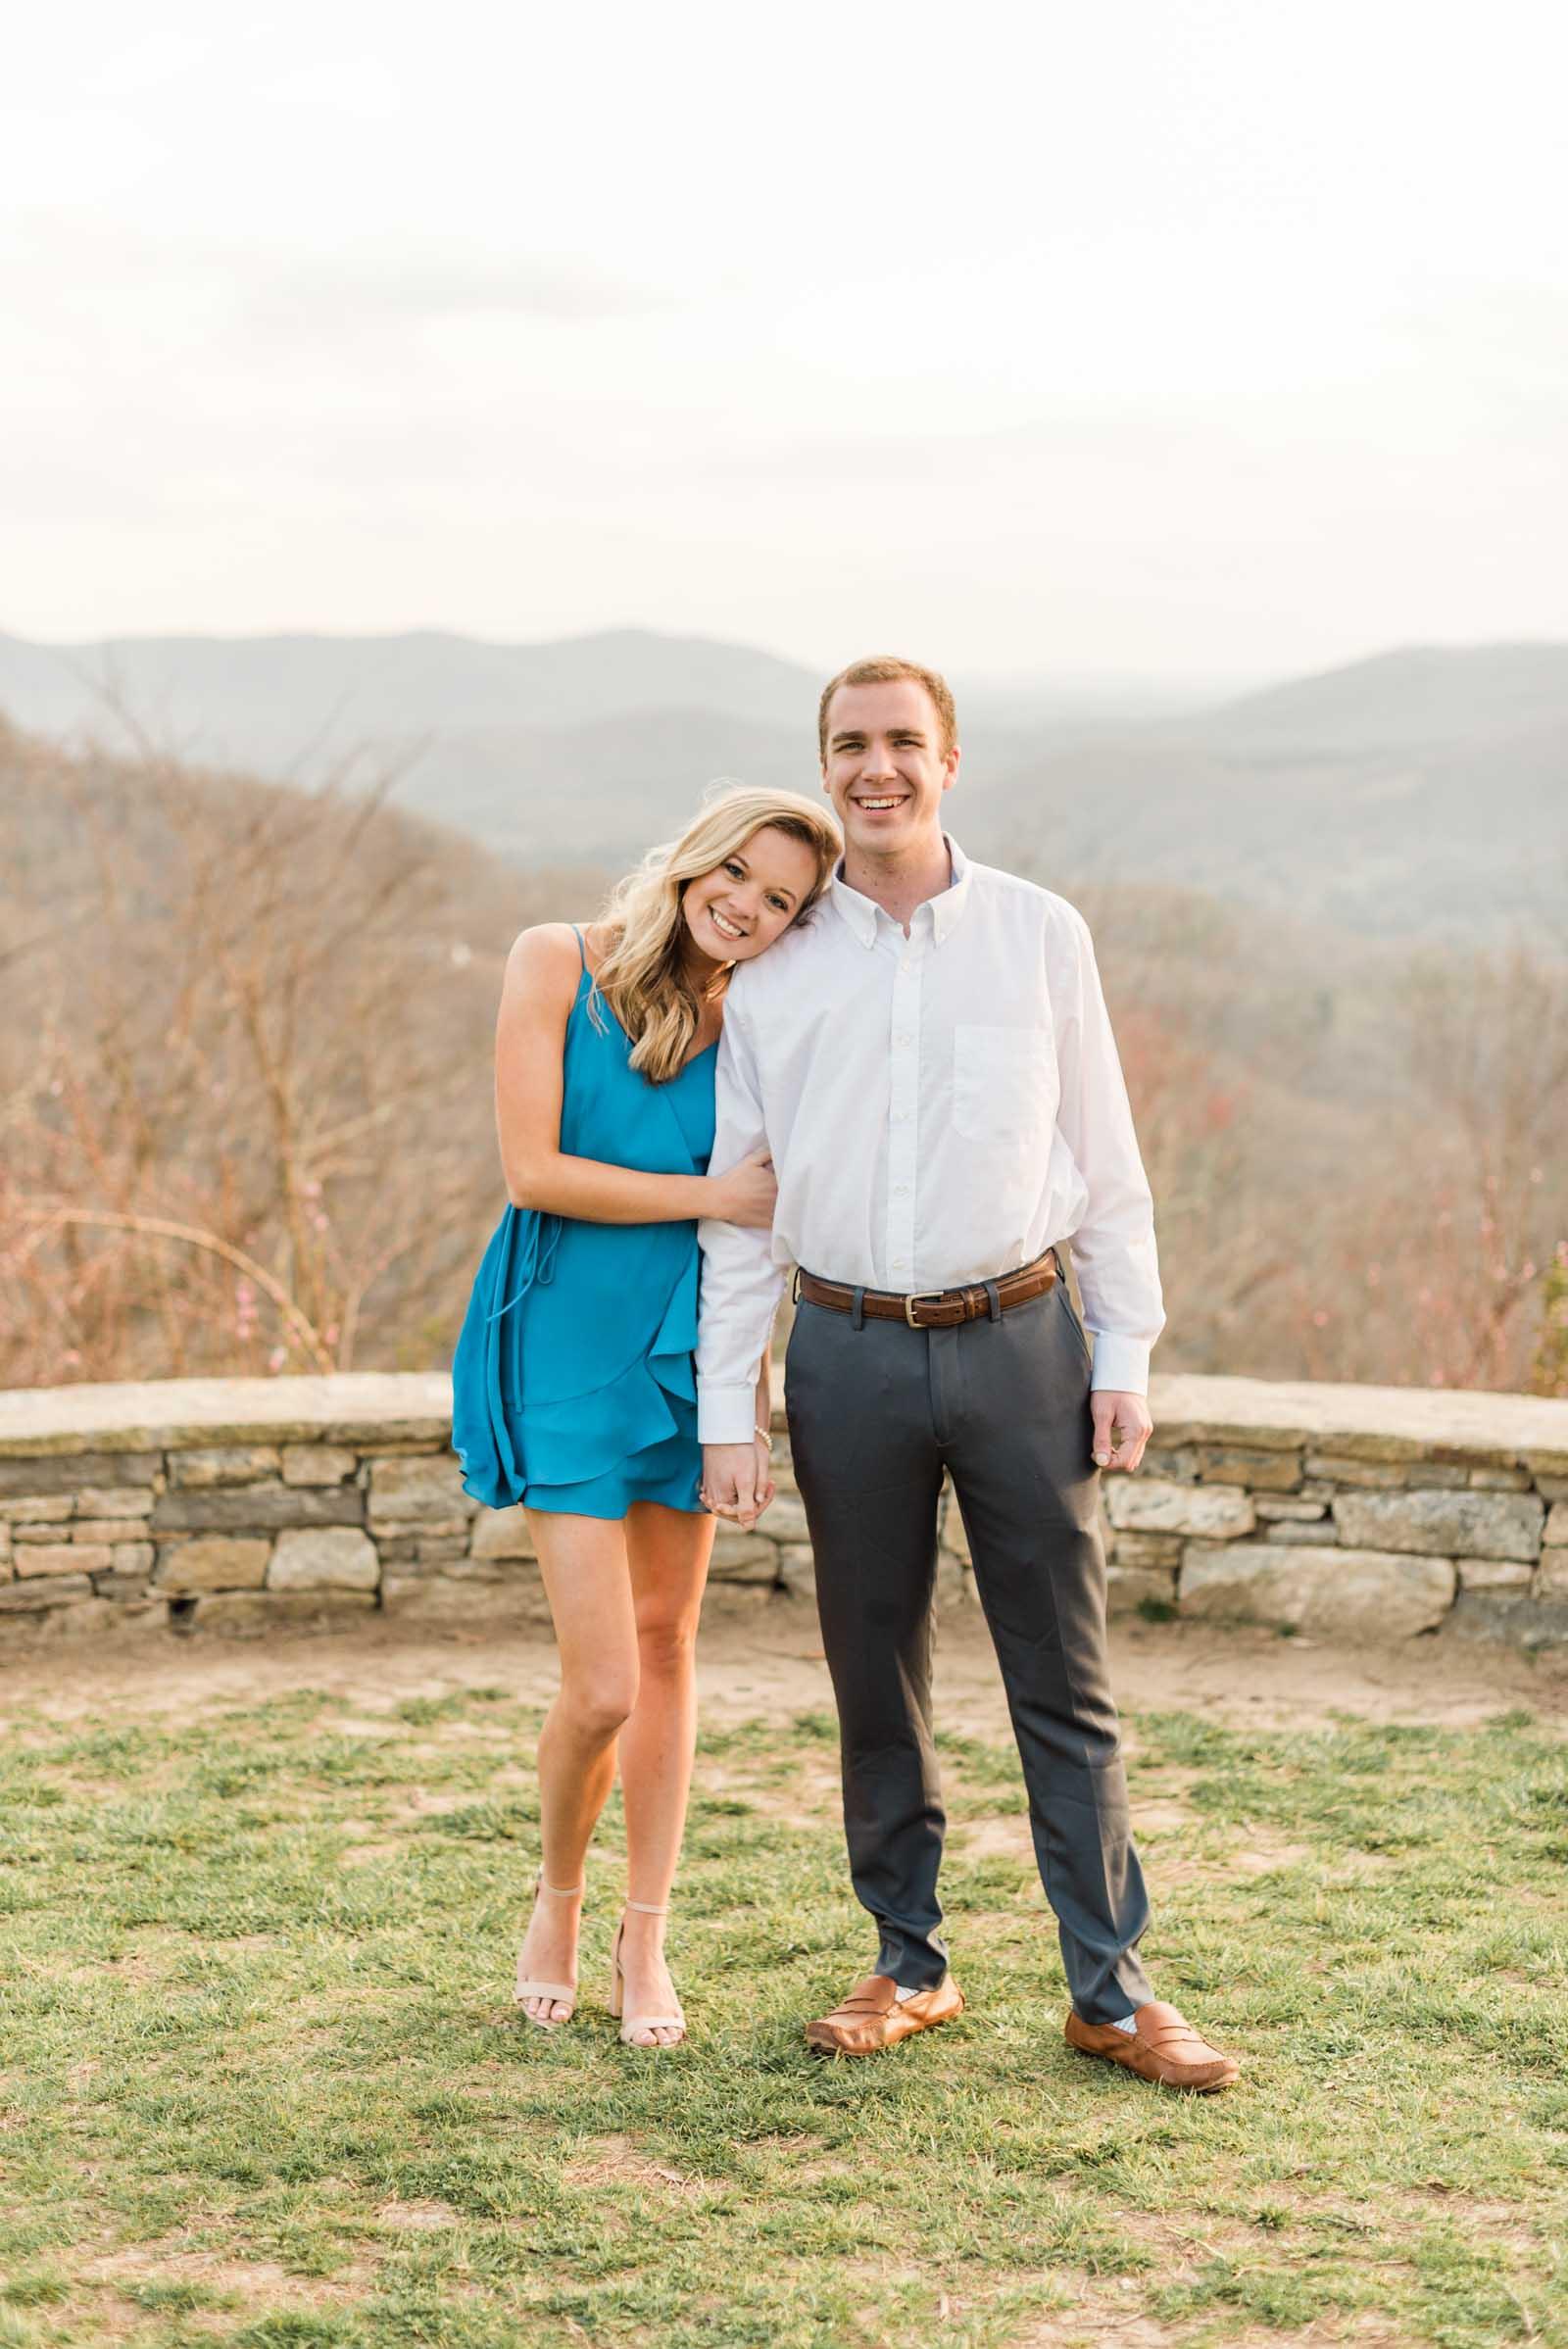 Sunset Mountain Engagement in North Carolina Morgan & Nathan Markie Walden Photography-13.jpg